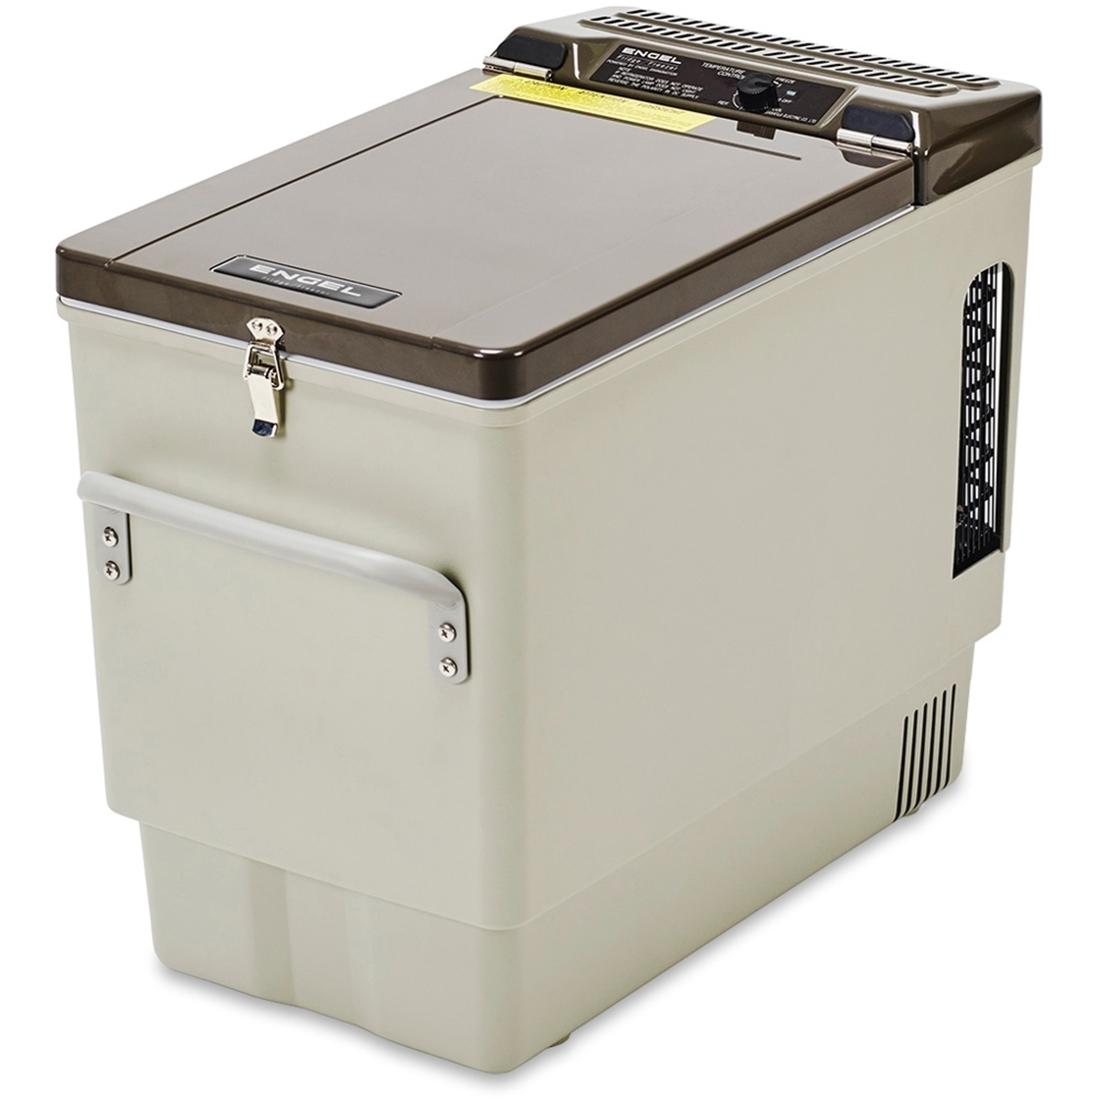 Engel MD27F 21L Fridge Freezer